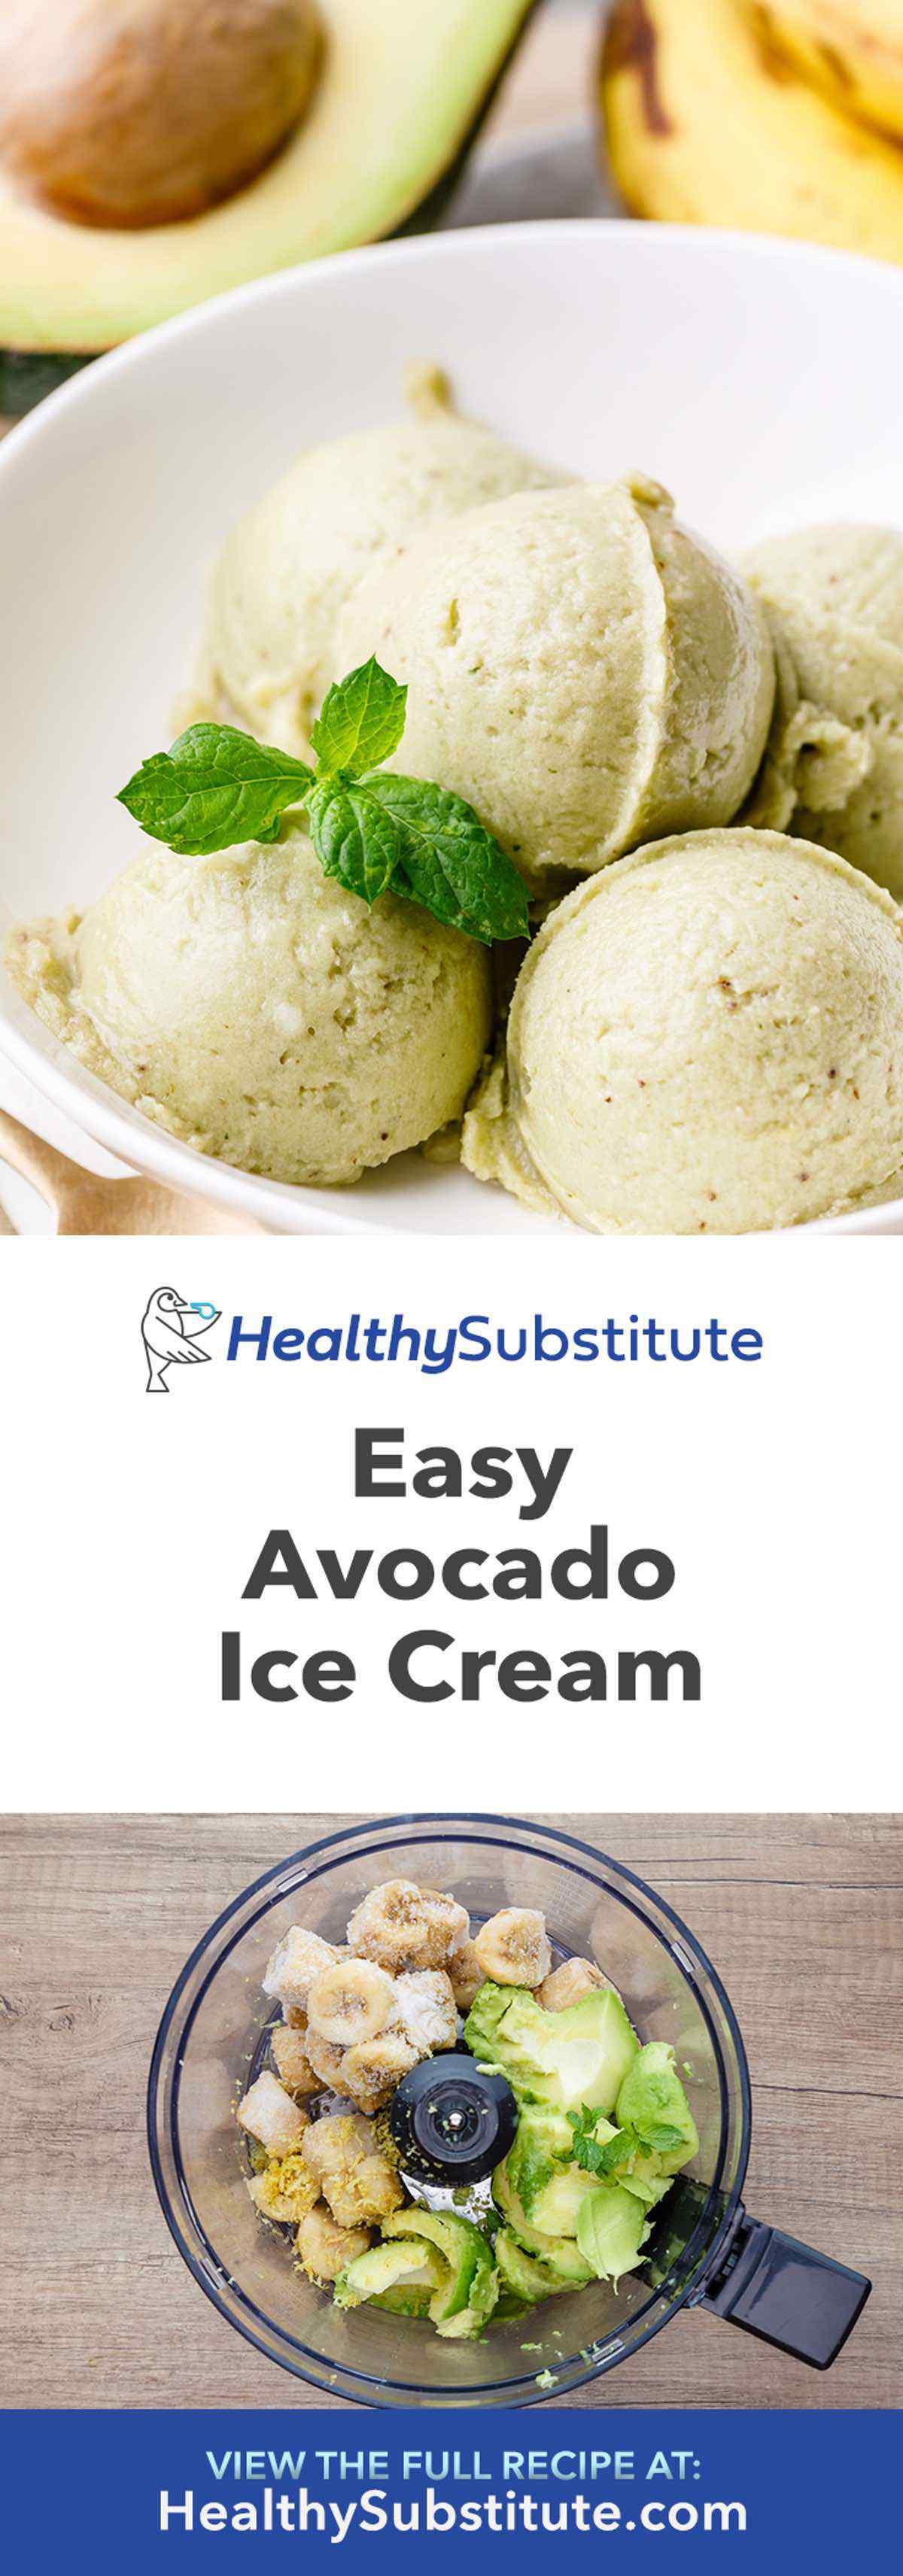 Avocado Ice Cream Recipe No Eggs